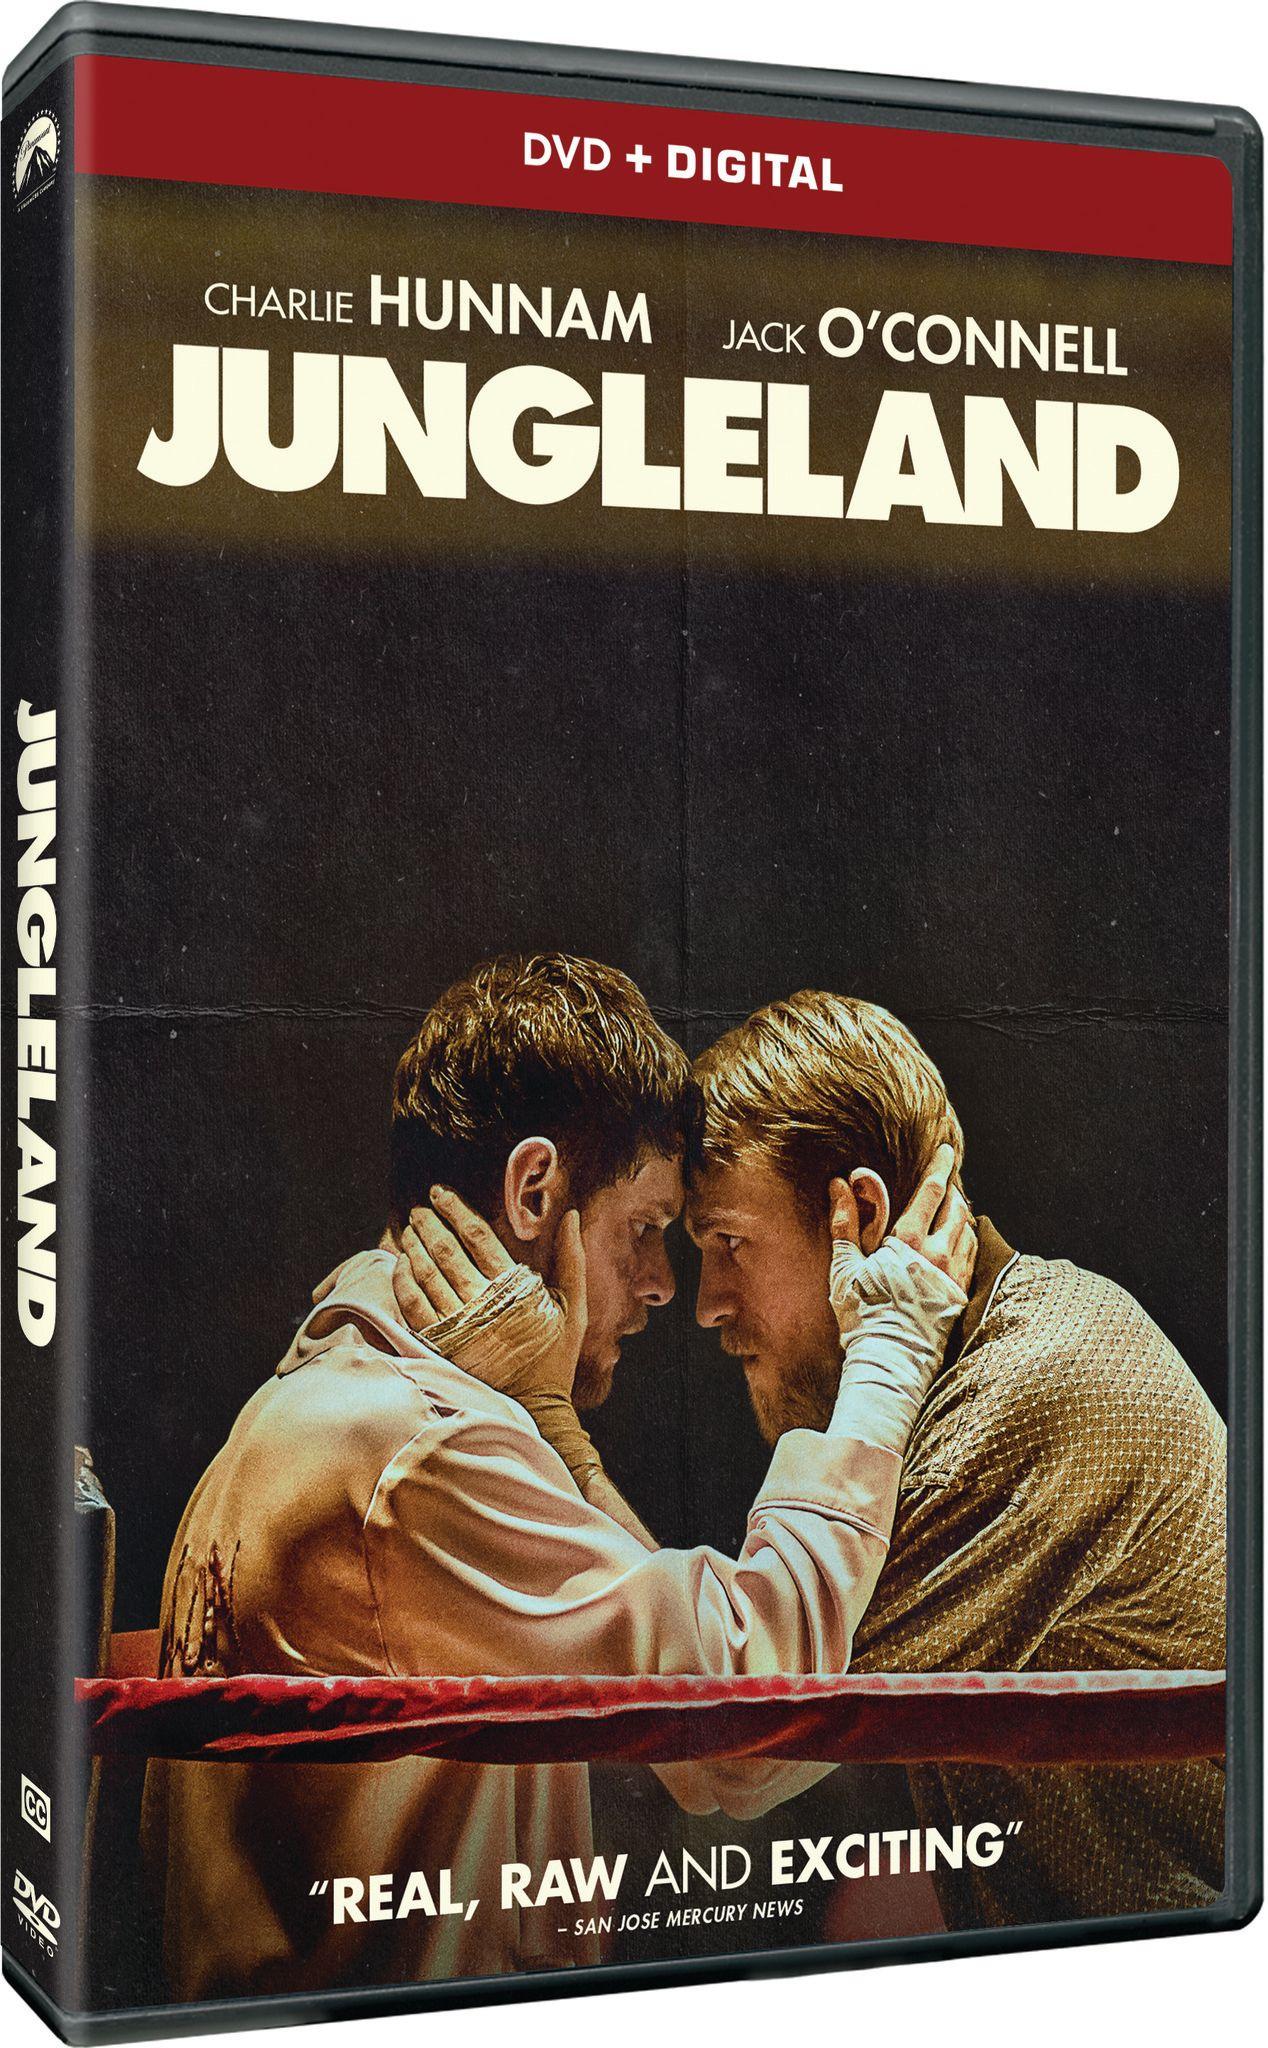 Jungleland Blu-ray Review